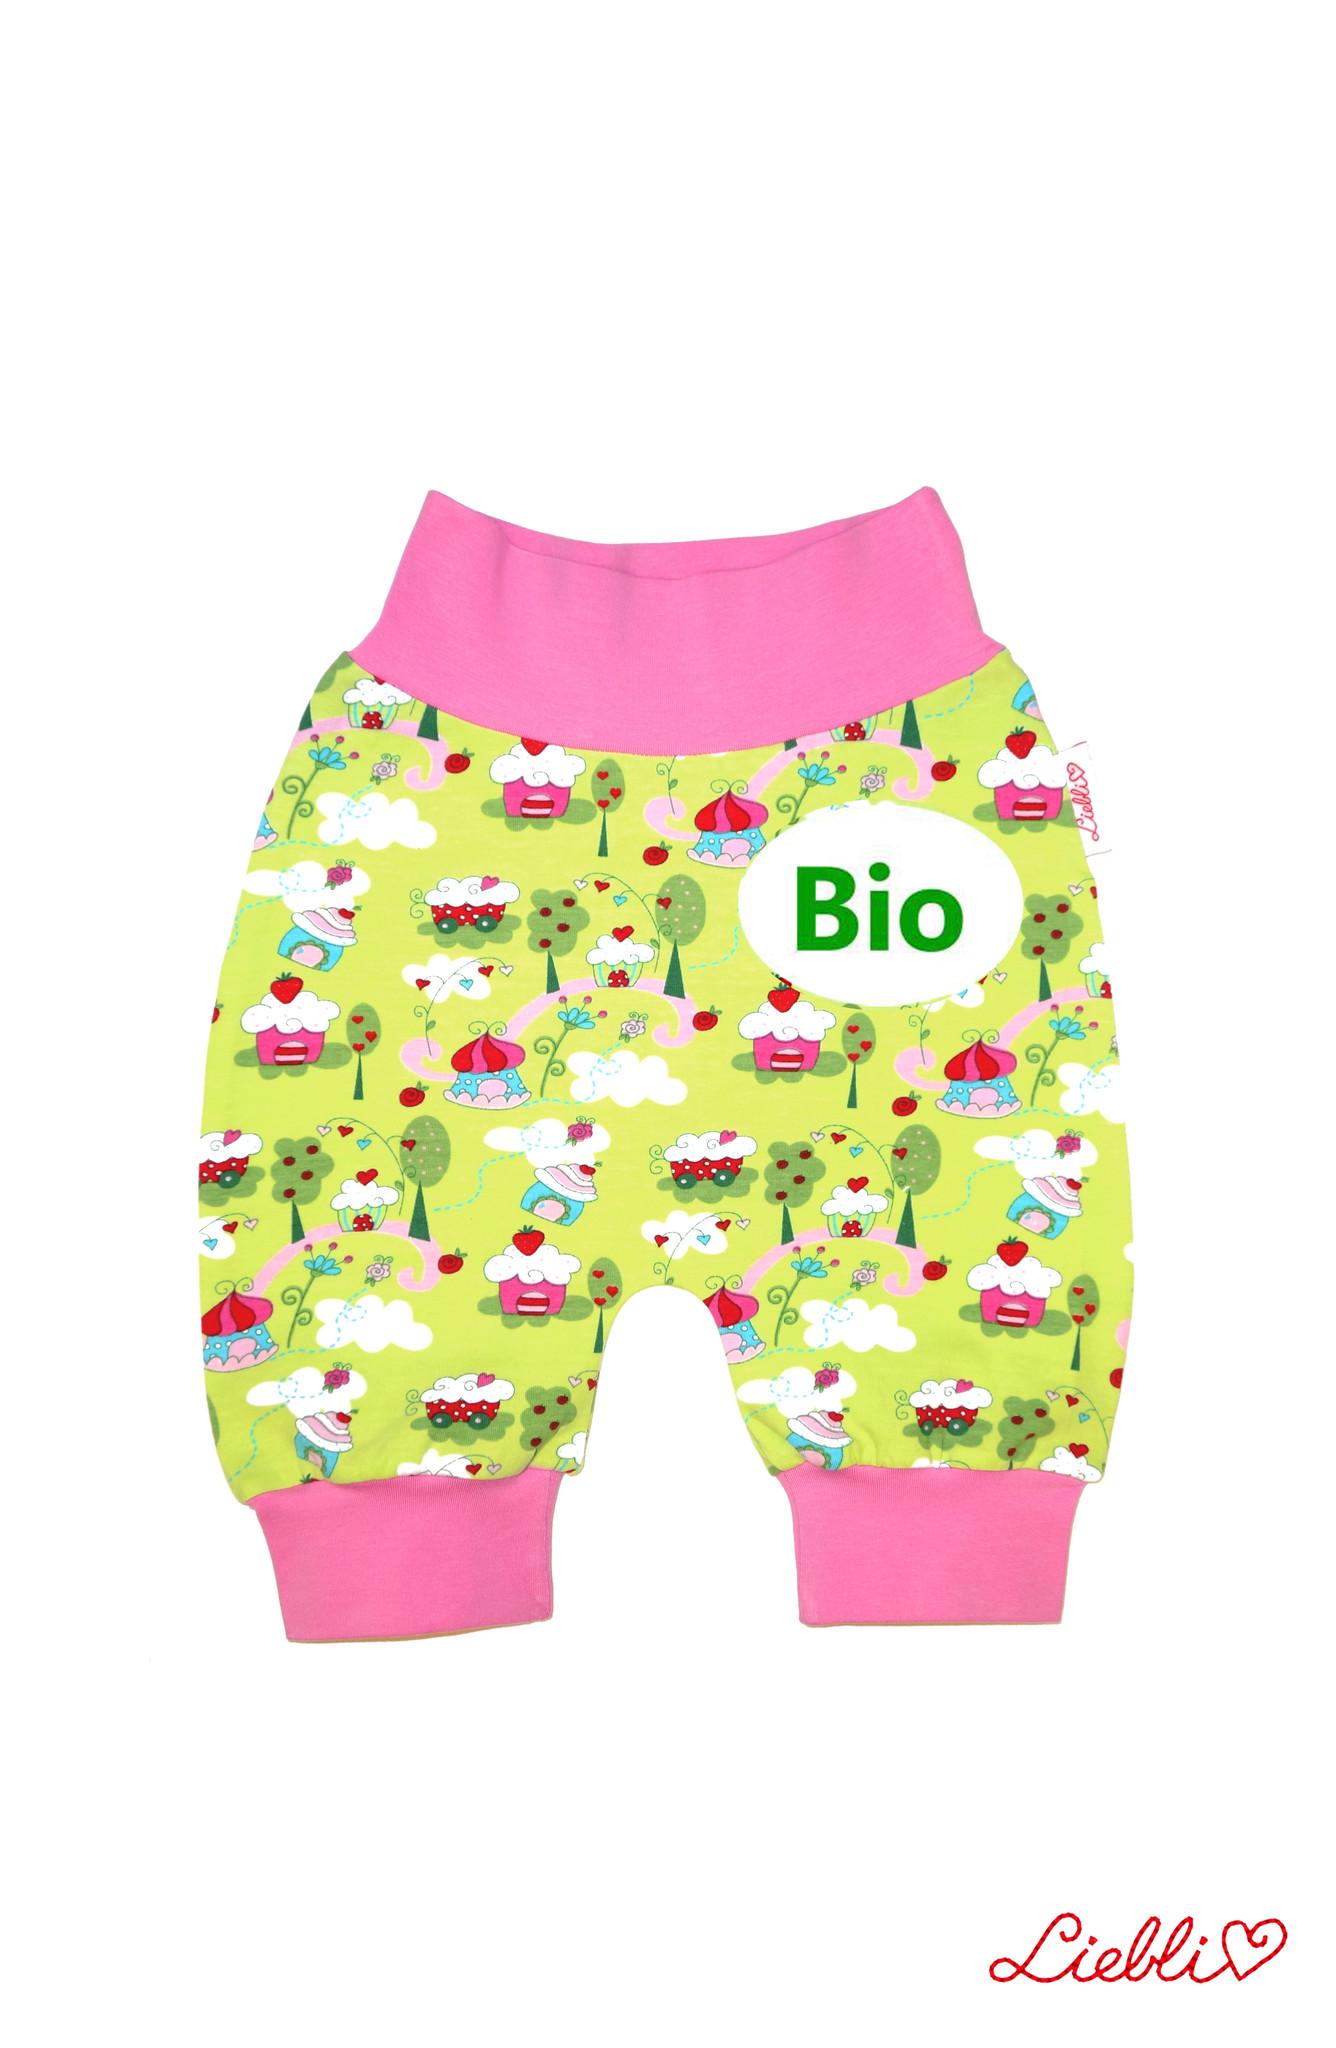 BIO Babyhose/ Pumphose, Muffins hellgrün rosa , 56, 62, 68